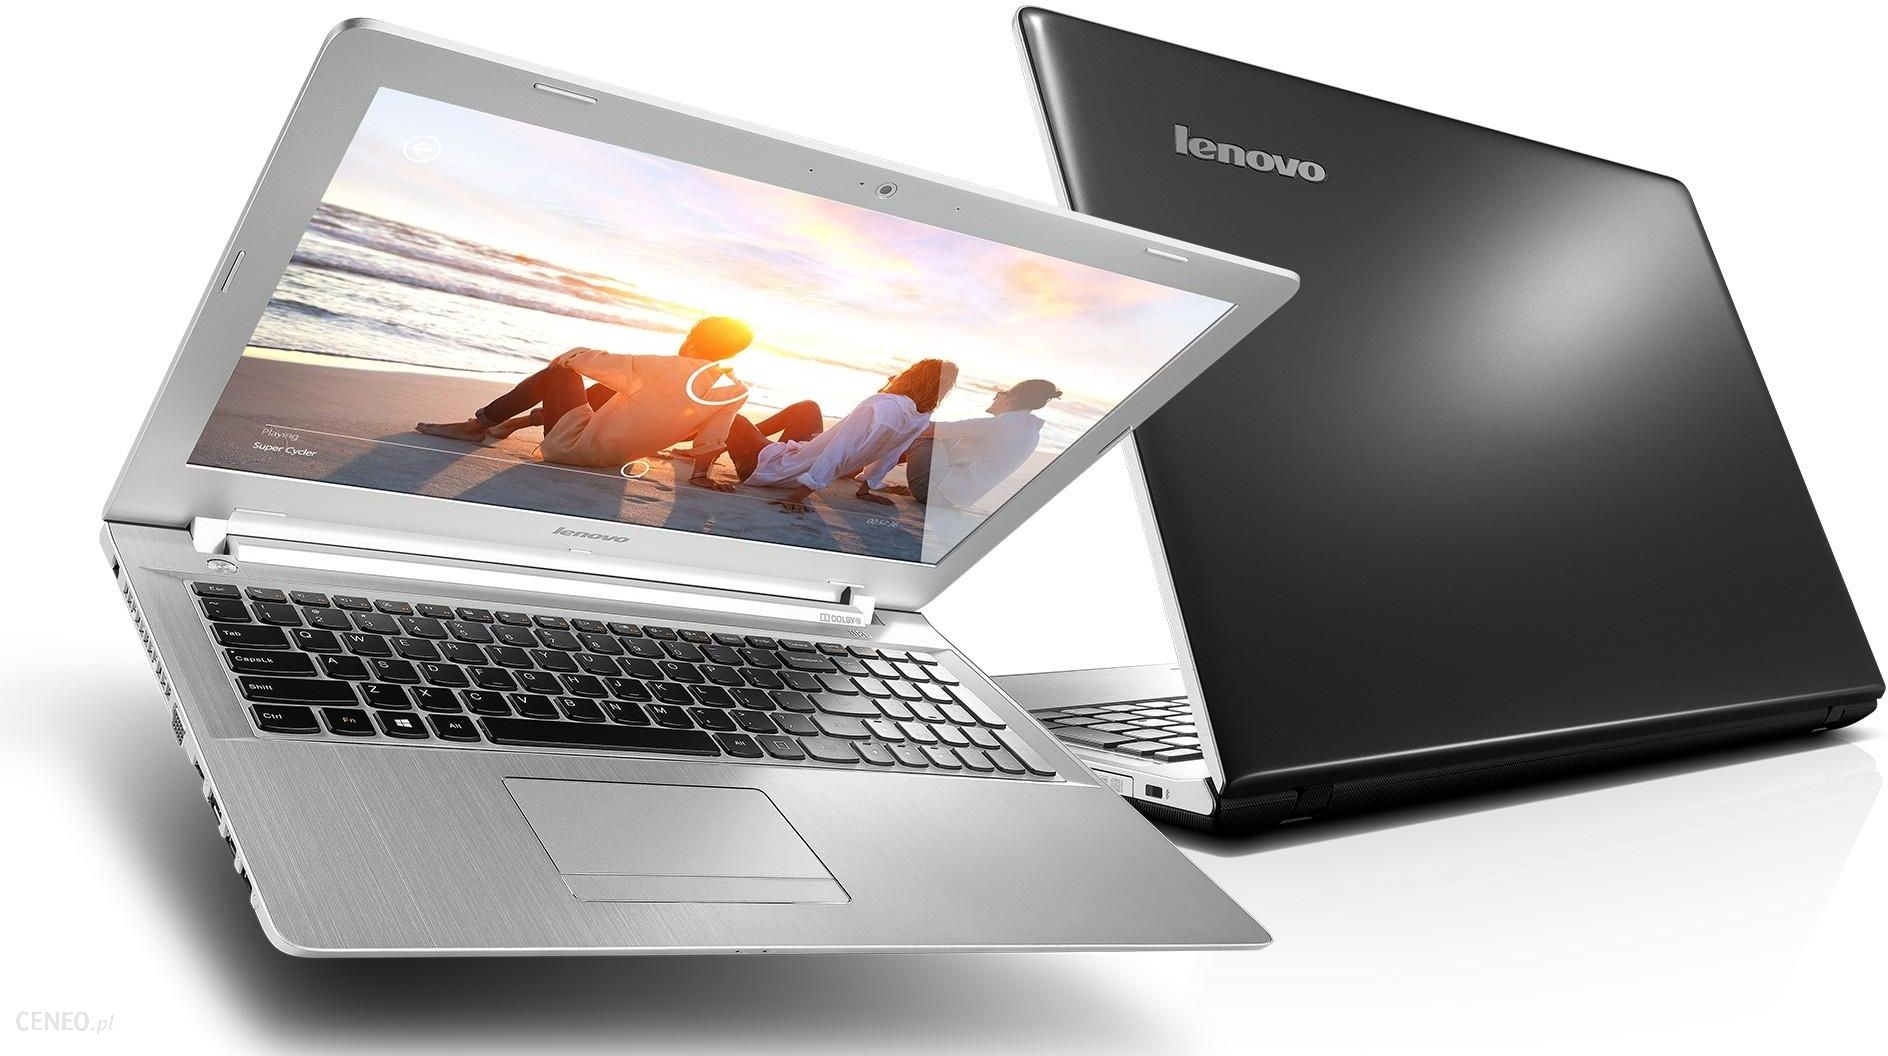 Laptop Lenovo IdeaPad Z51 70 80K601BYPB 8G1TSHDD zdjęcie 1